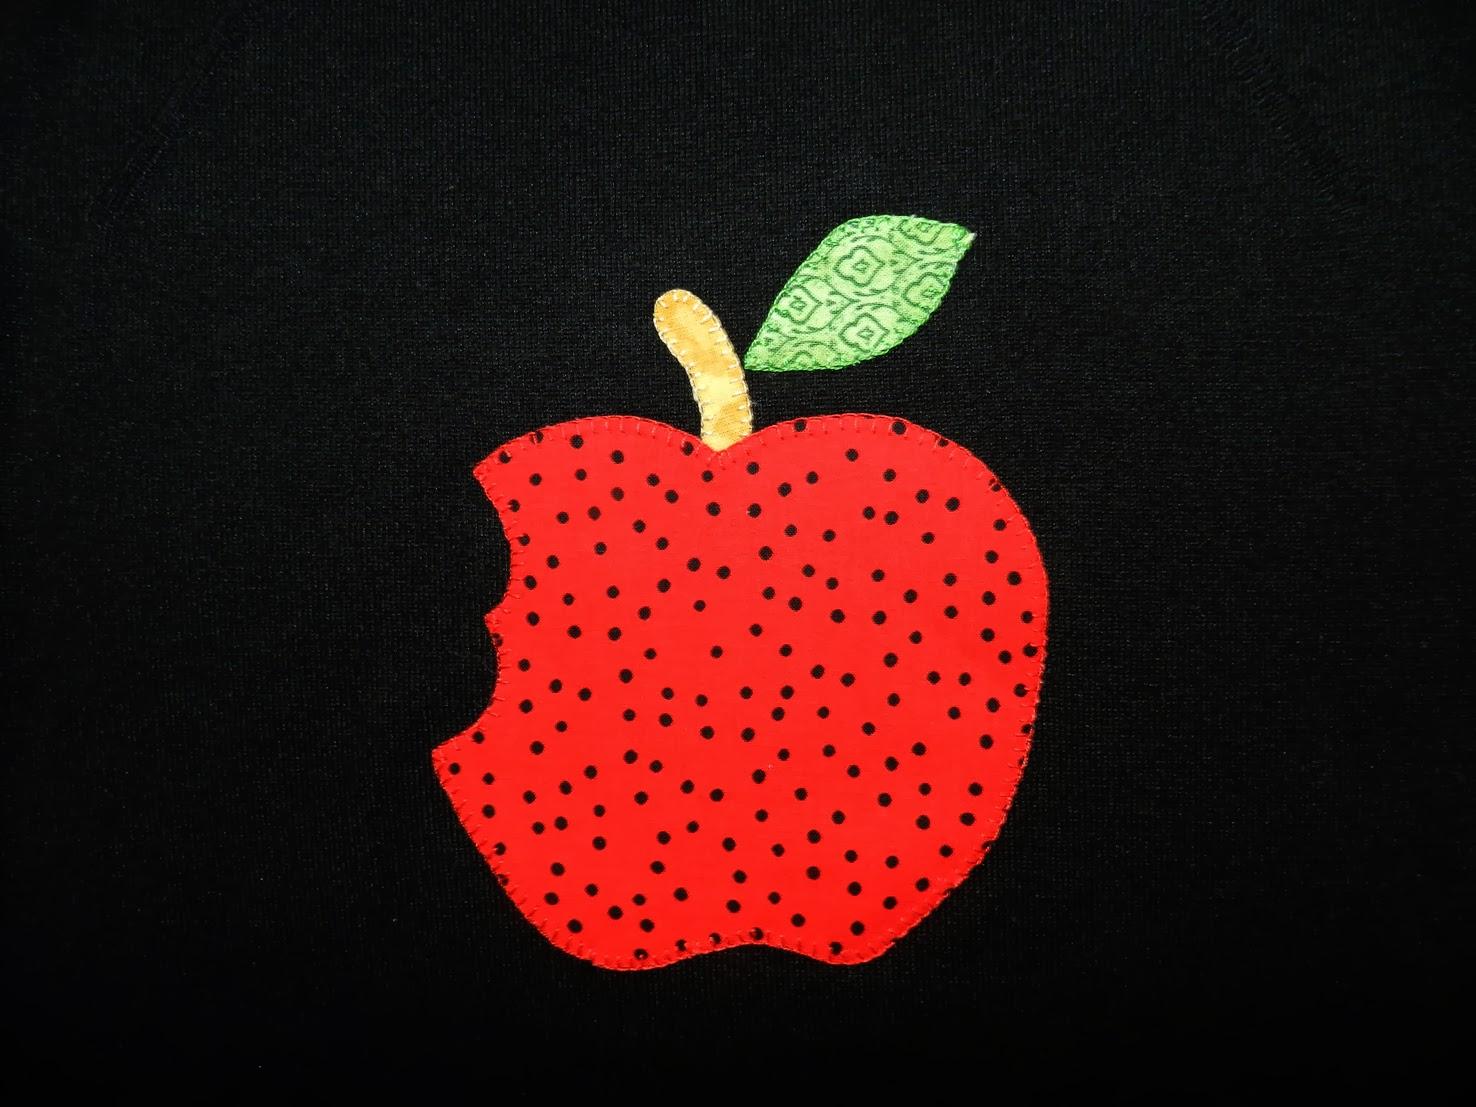 Camisetas patchwork, camiseta patchwork, camiseta con aplicaciones patchwork, aplicaciones, manzana mordida, camiseta manzana, camiseta manzana mordida, camiseta adulto patchwork, camiseta mujer,